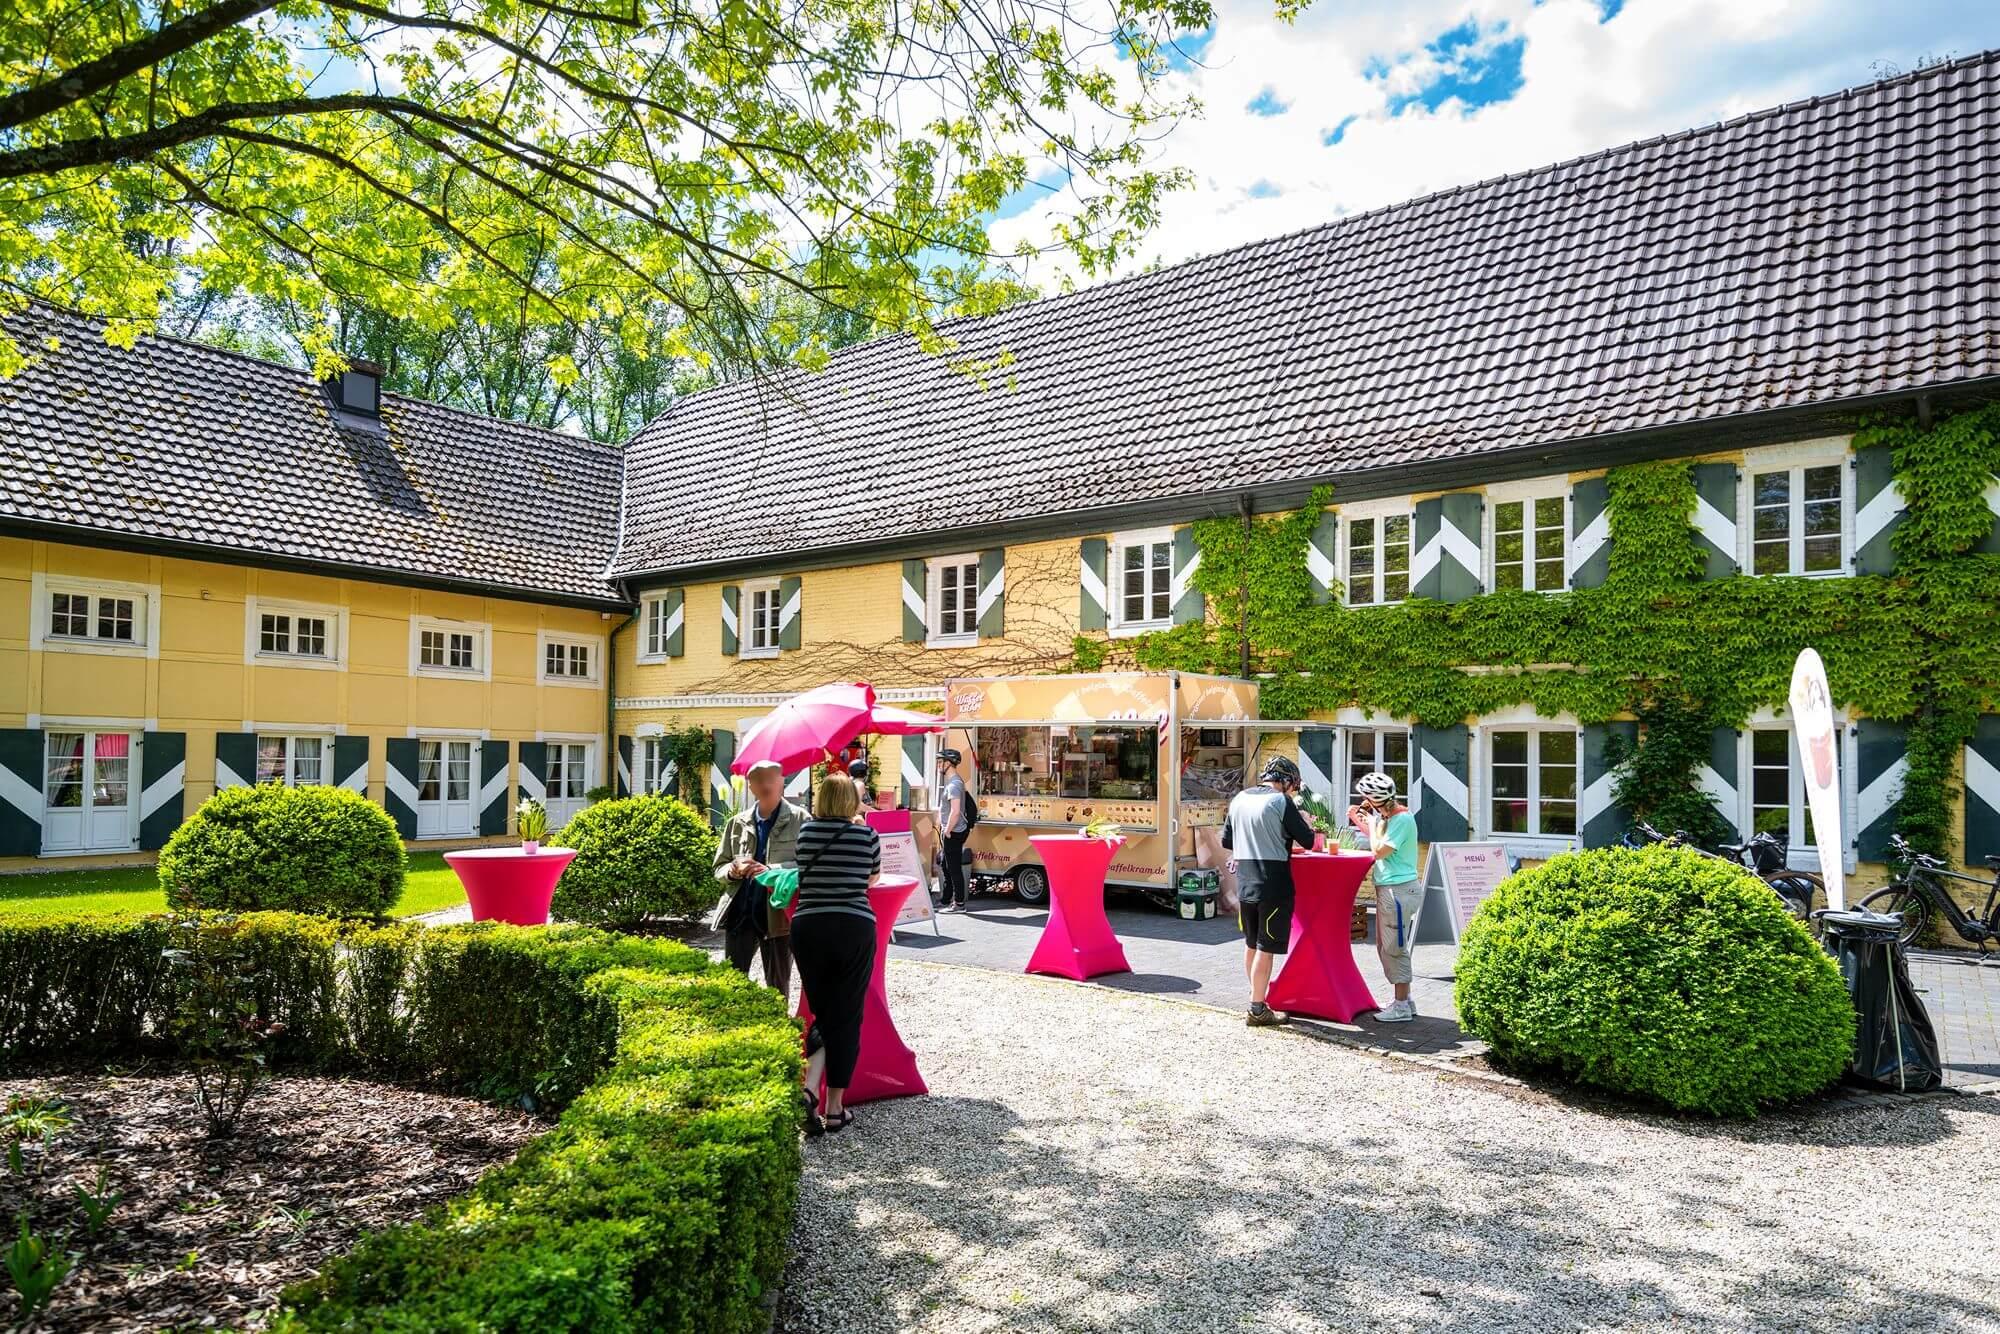 foodtruck-catering-wasserburg-langenfeld-wk1